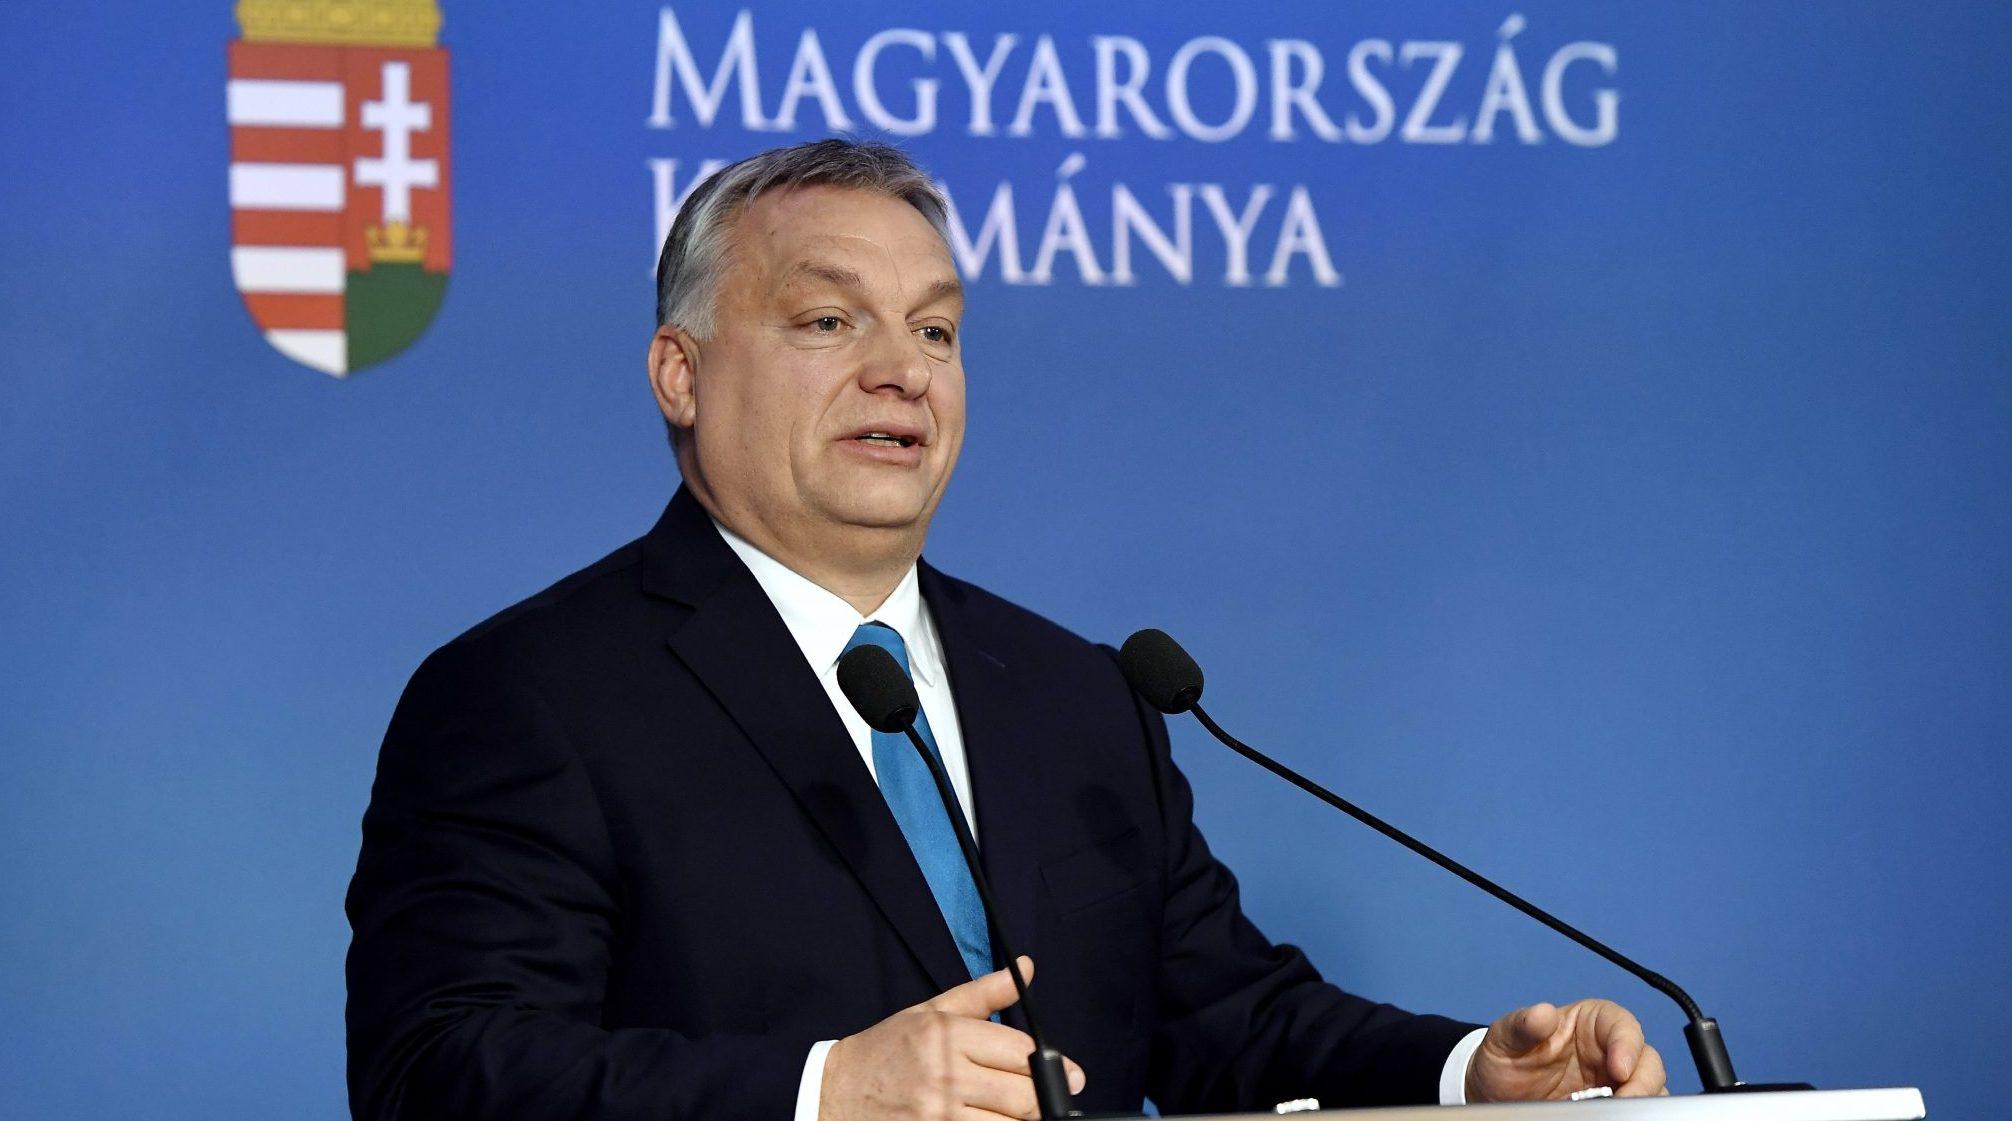 PM Orbán